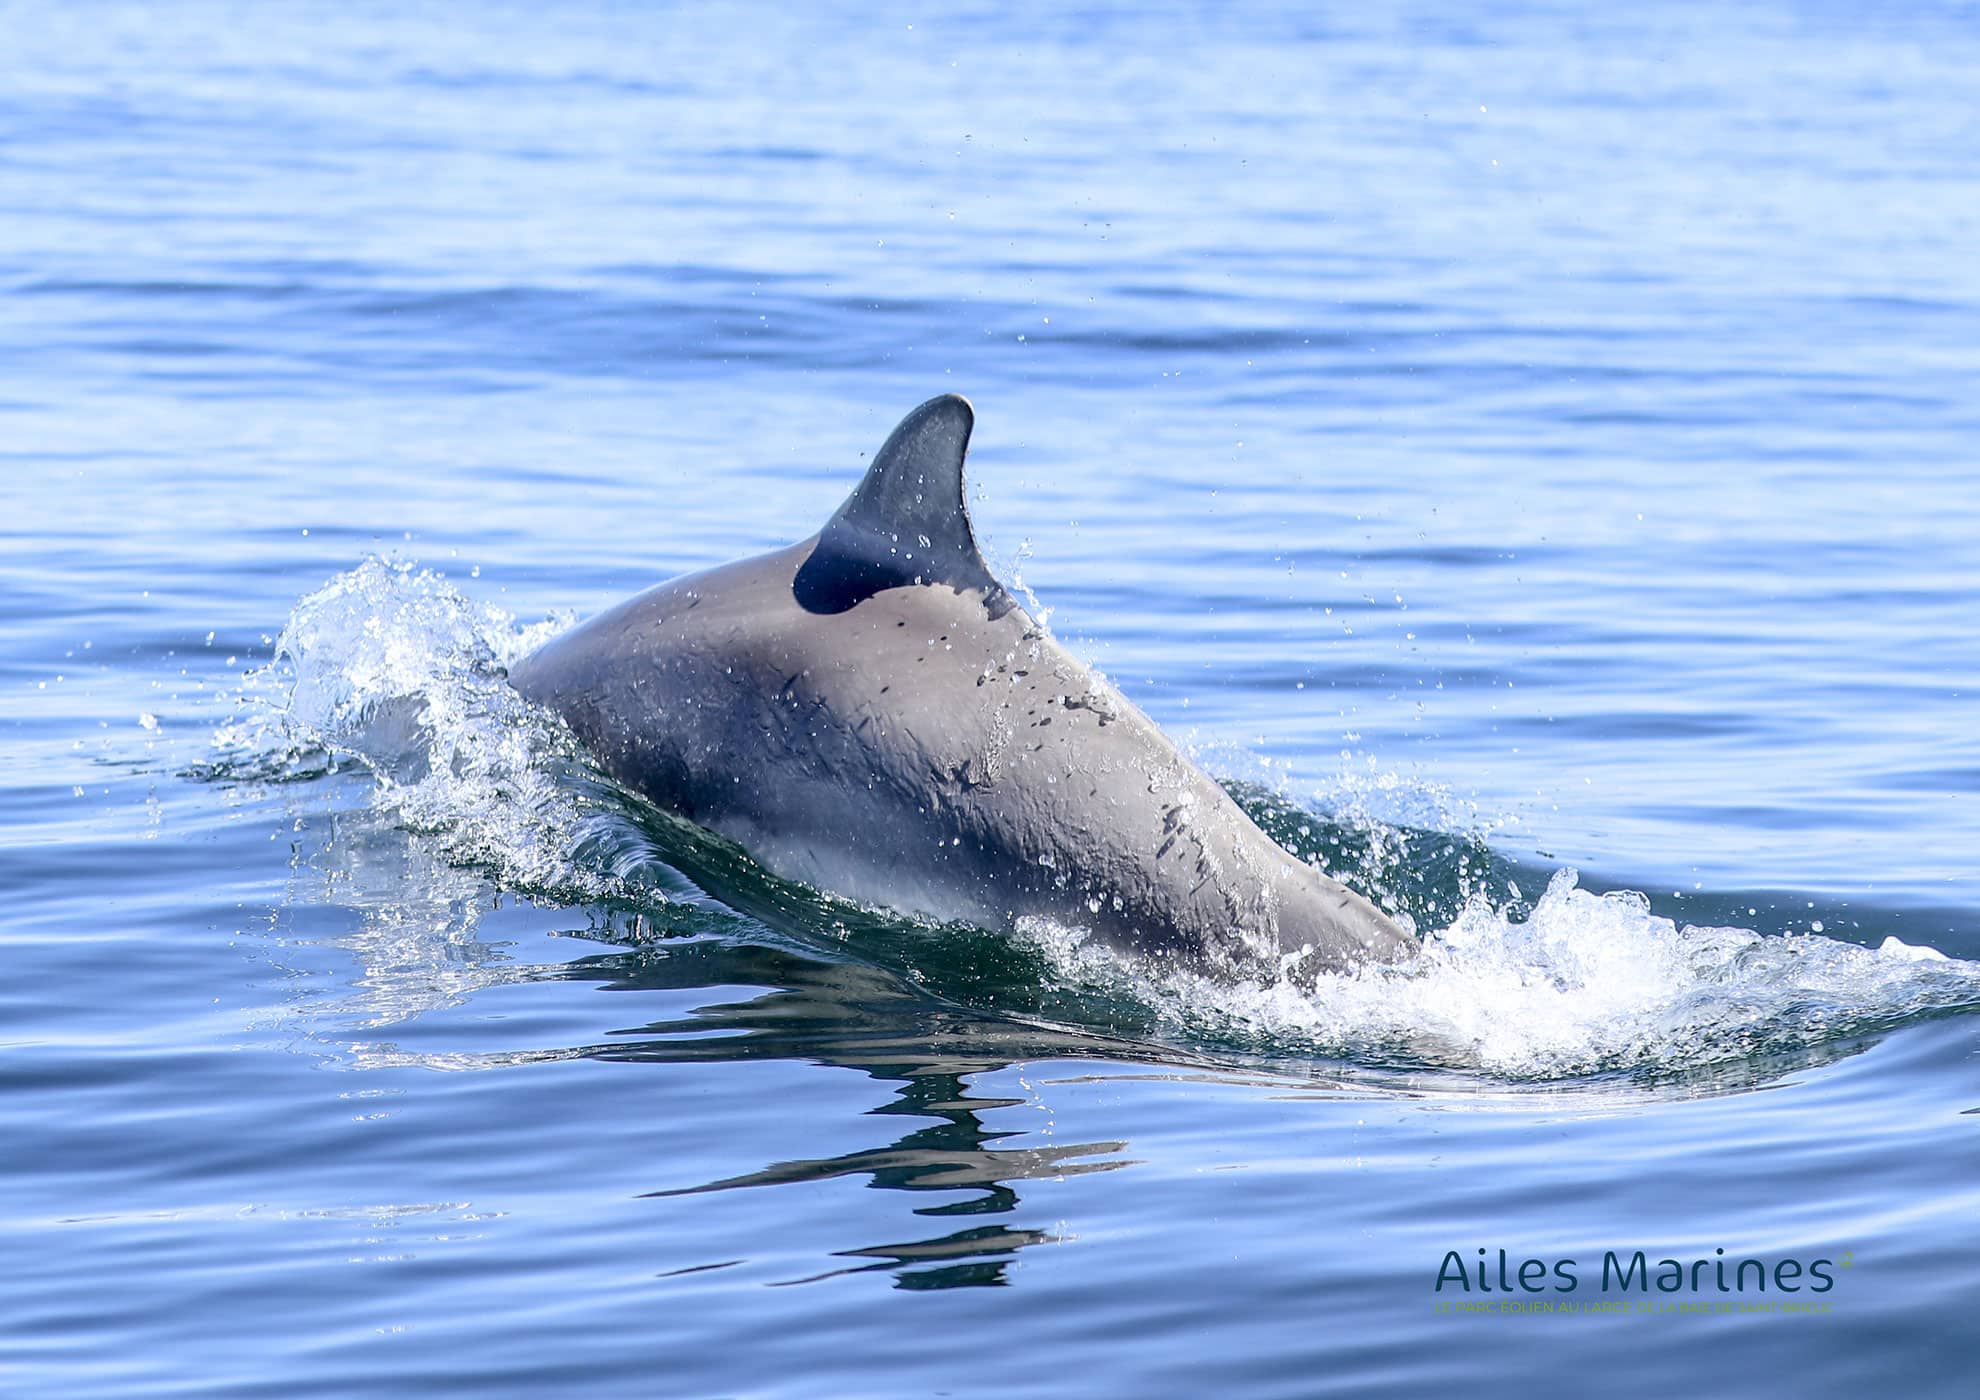 ailes-marines-navy-dolphin-fins